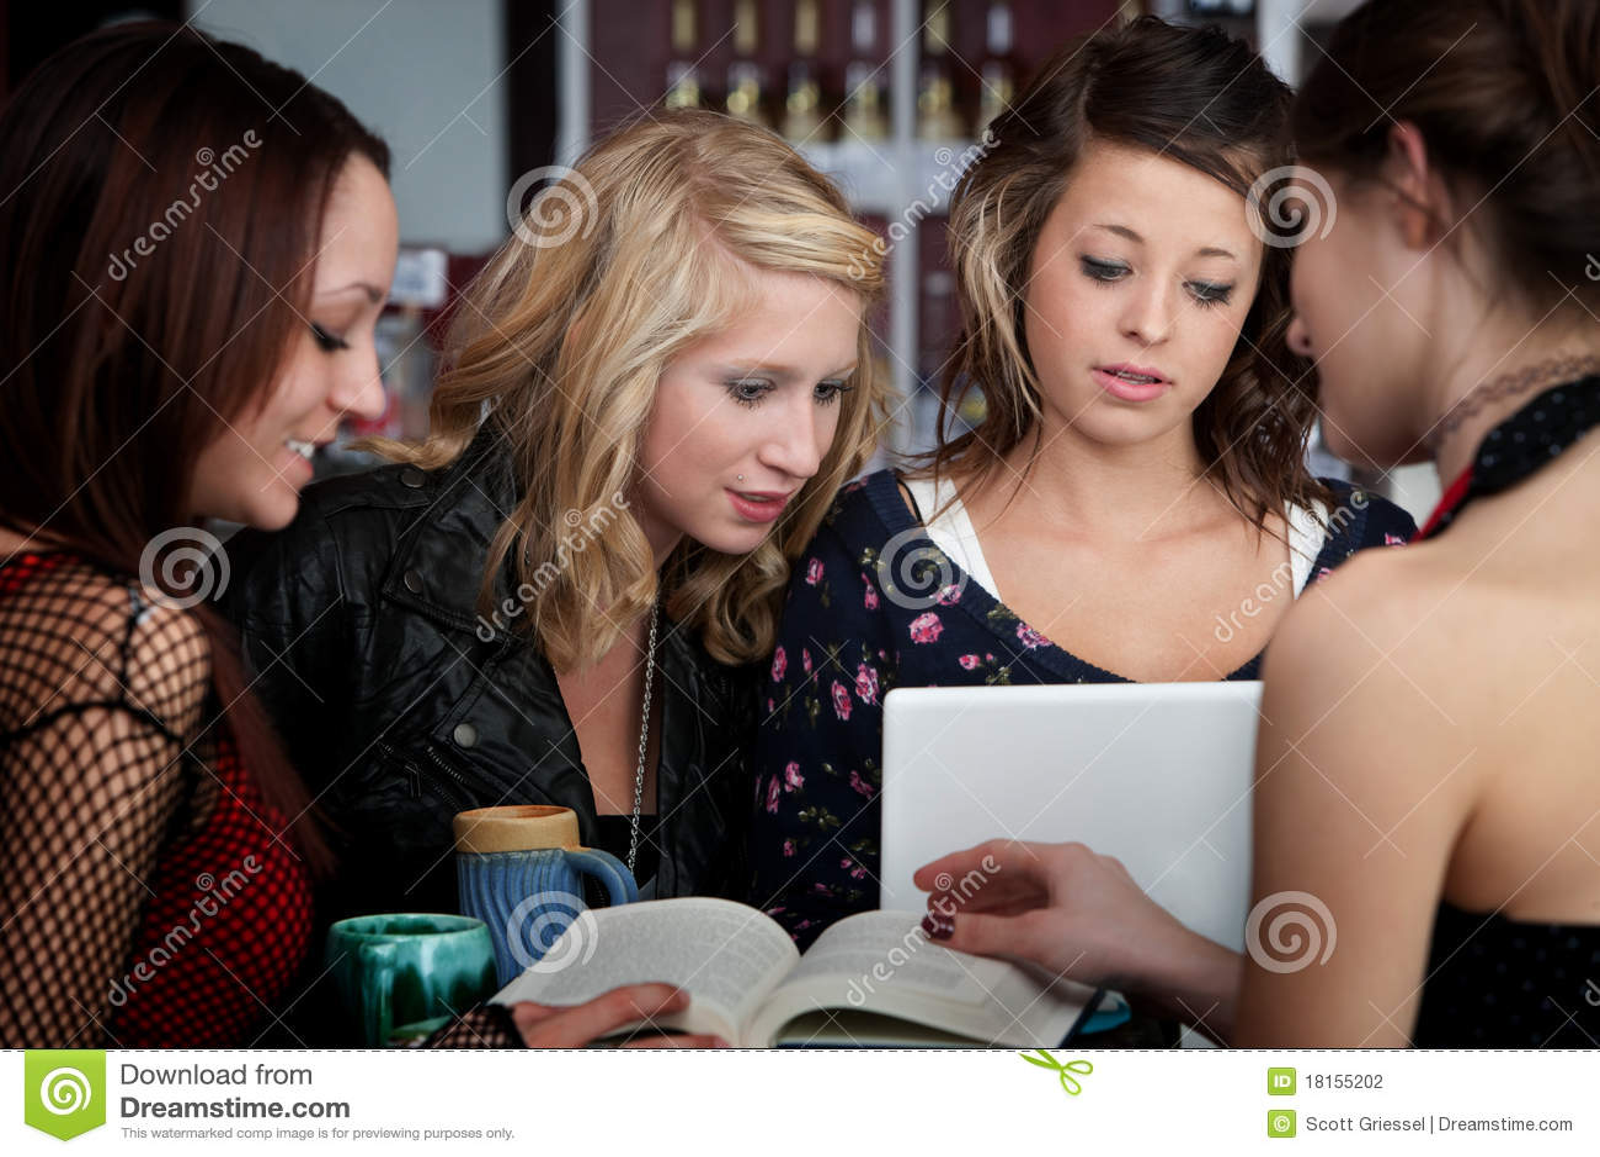 Four Students Do Their Homework